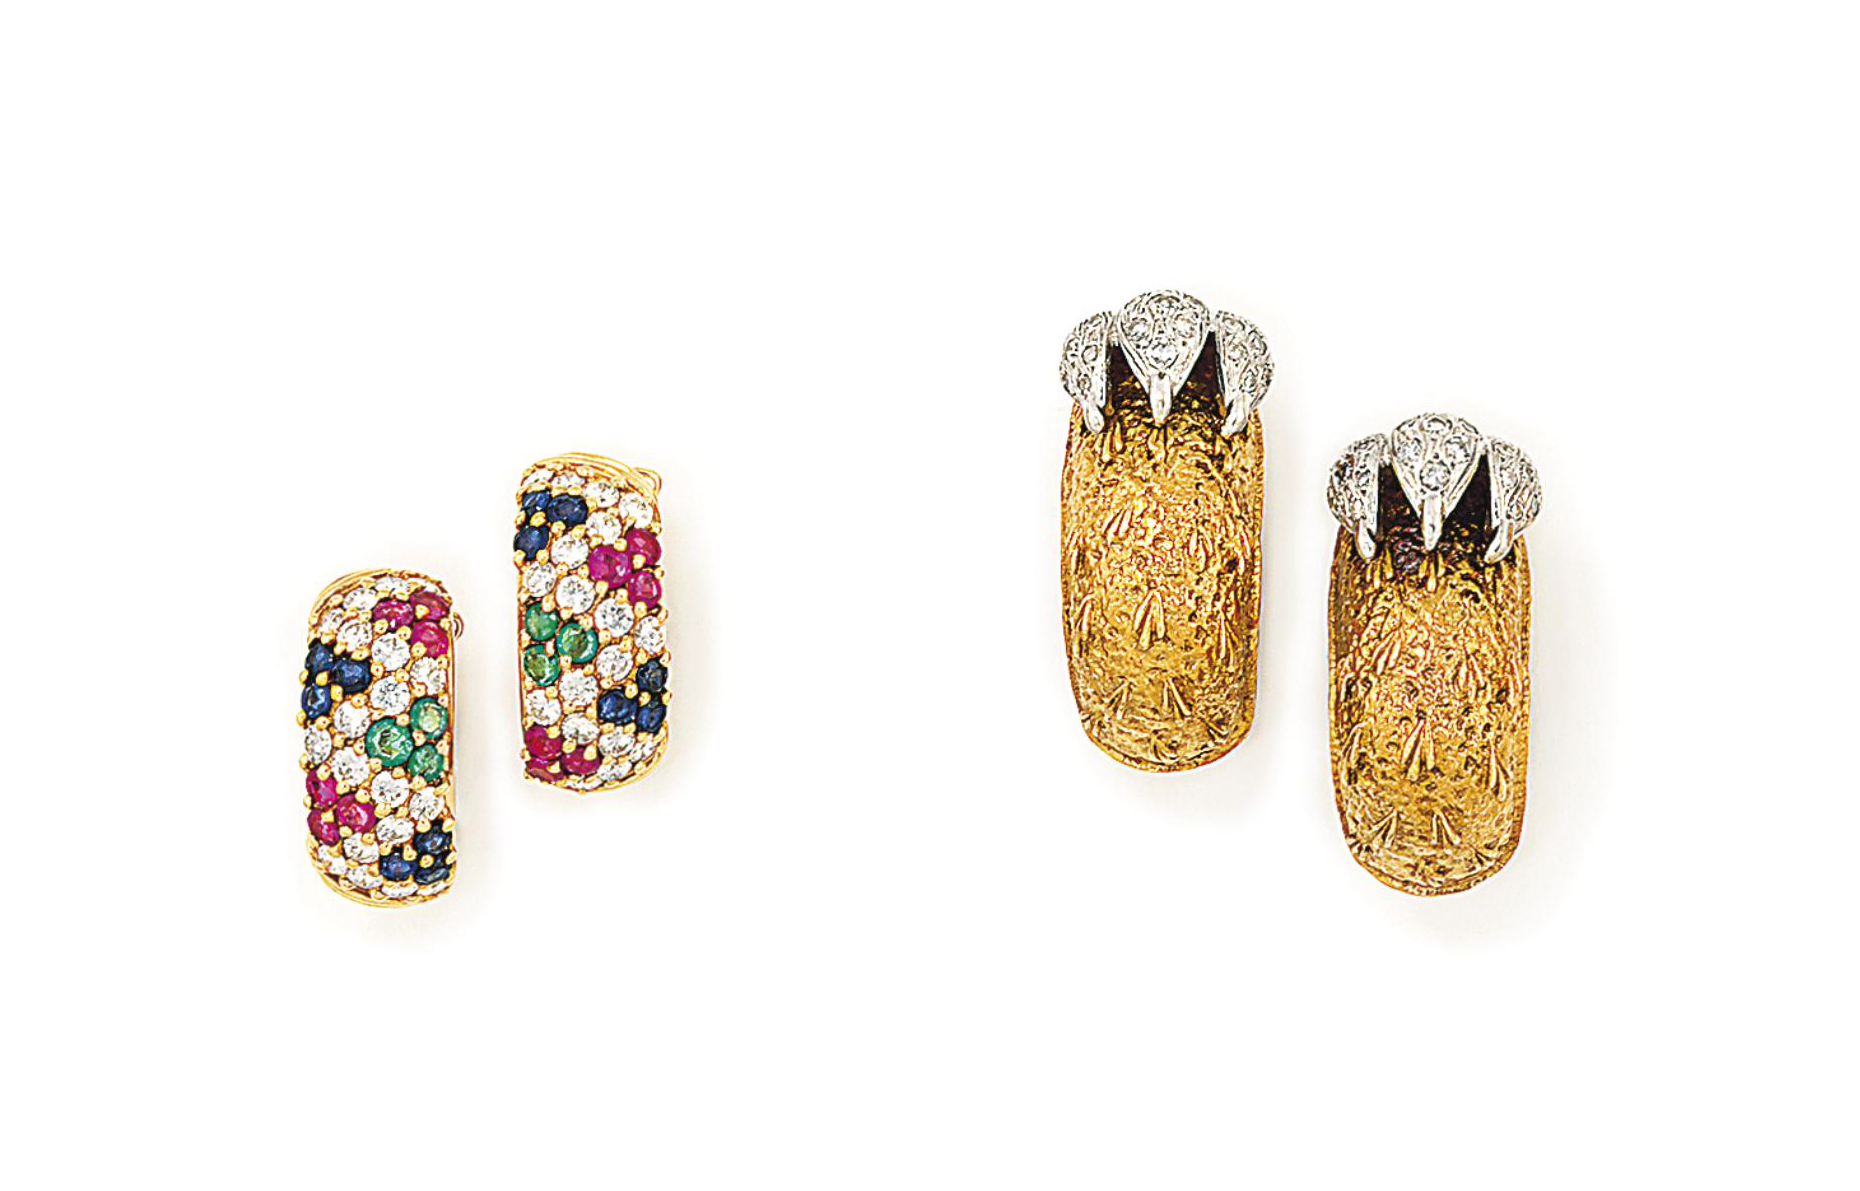 A PAIR OF DIAMOND-SET EARRINGS, BY FRASCAROLO AND A PAIR OF GEM-SET EARRINGS